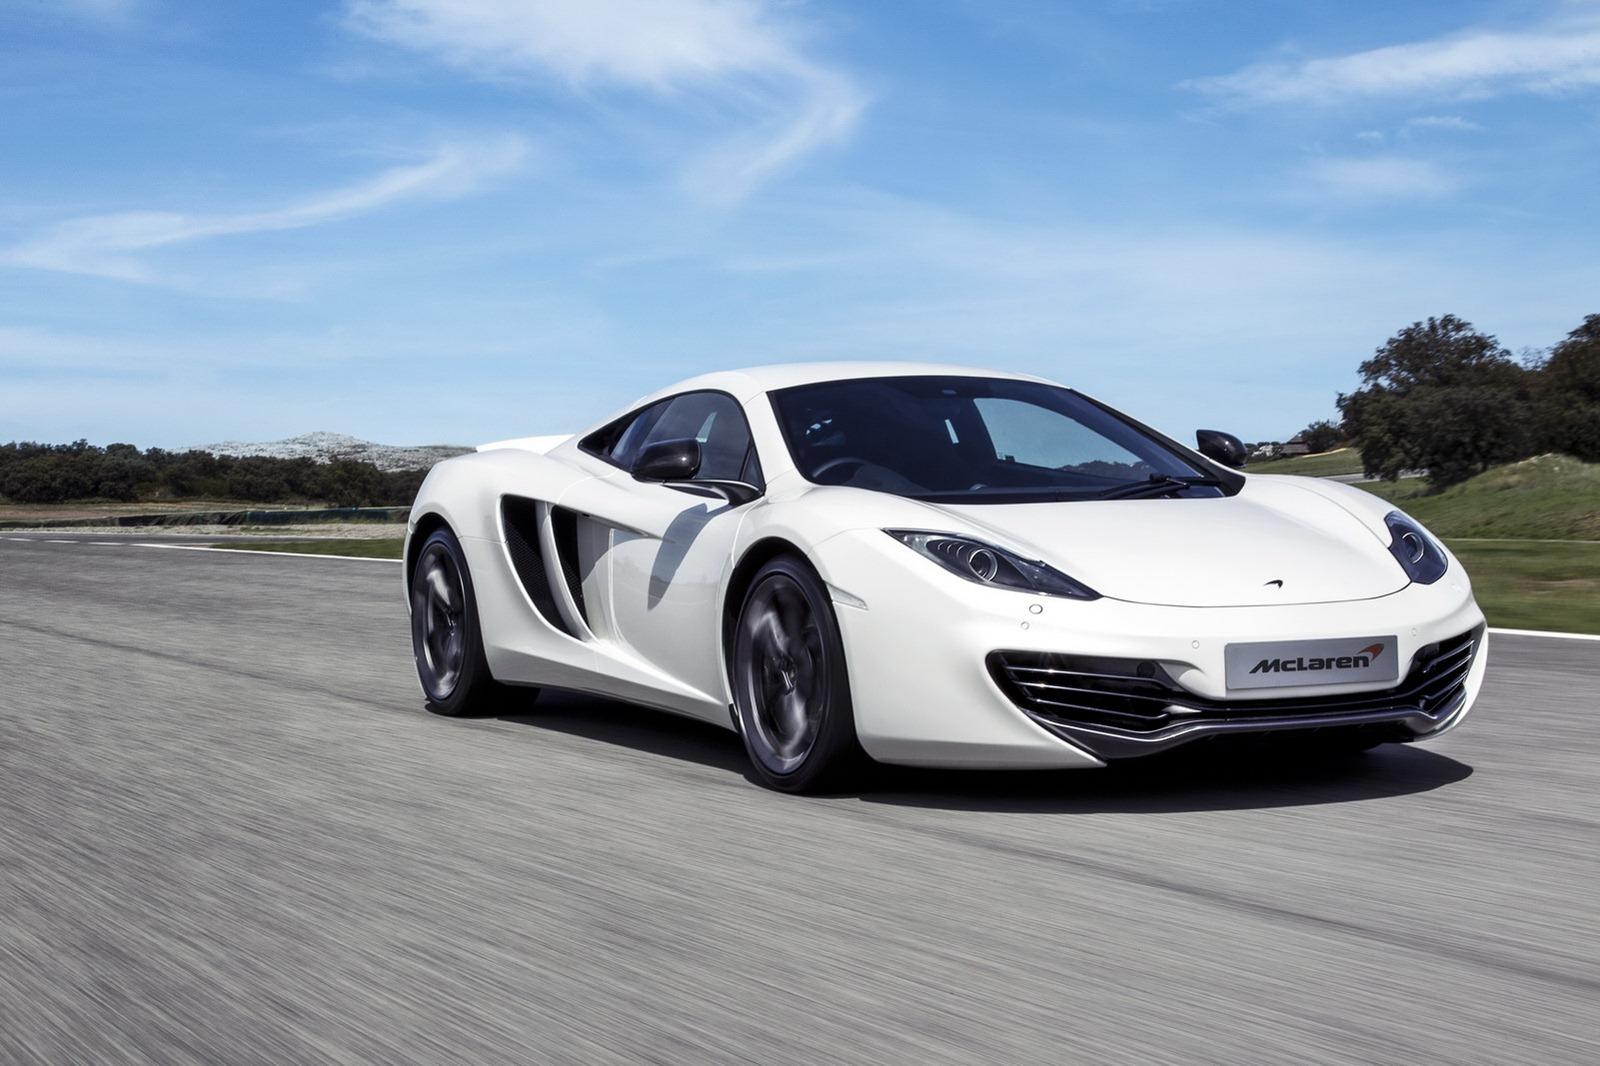 2013-McLaren-MP4-12C-3%5B2%5D.jpg